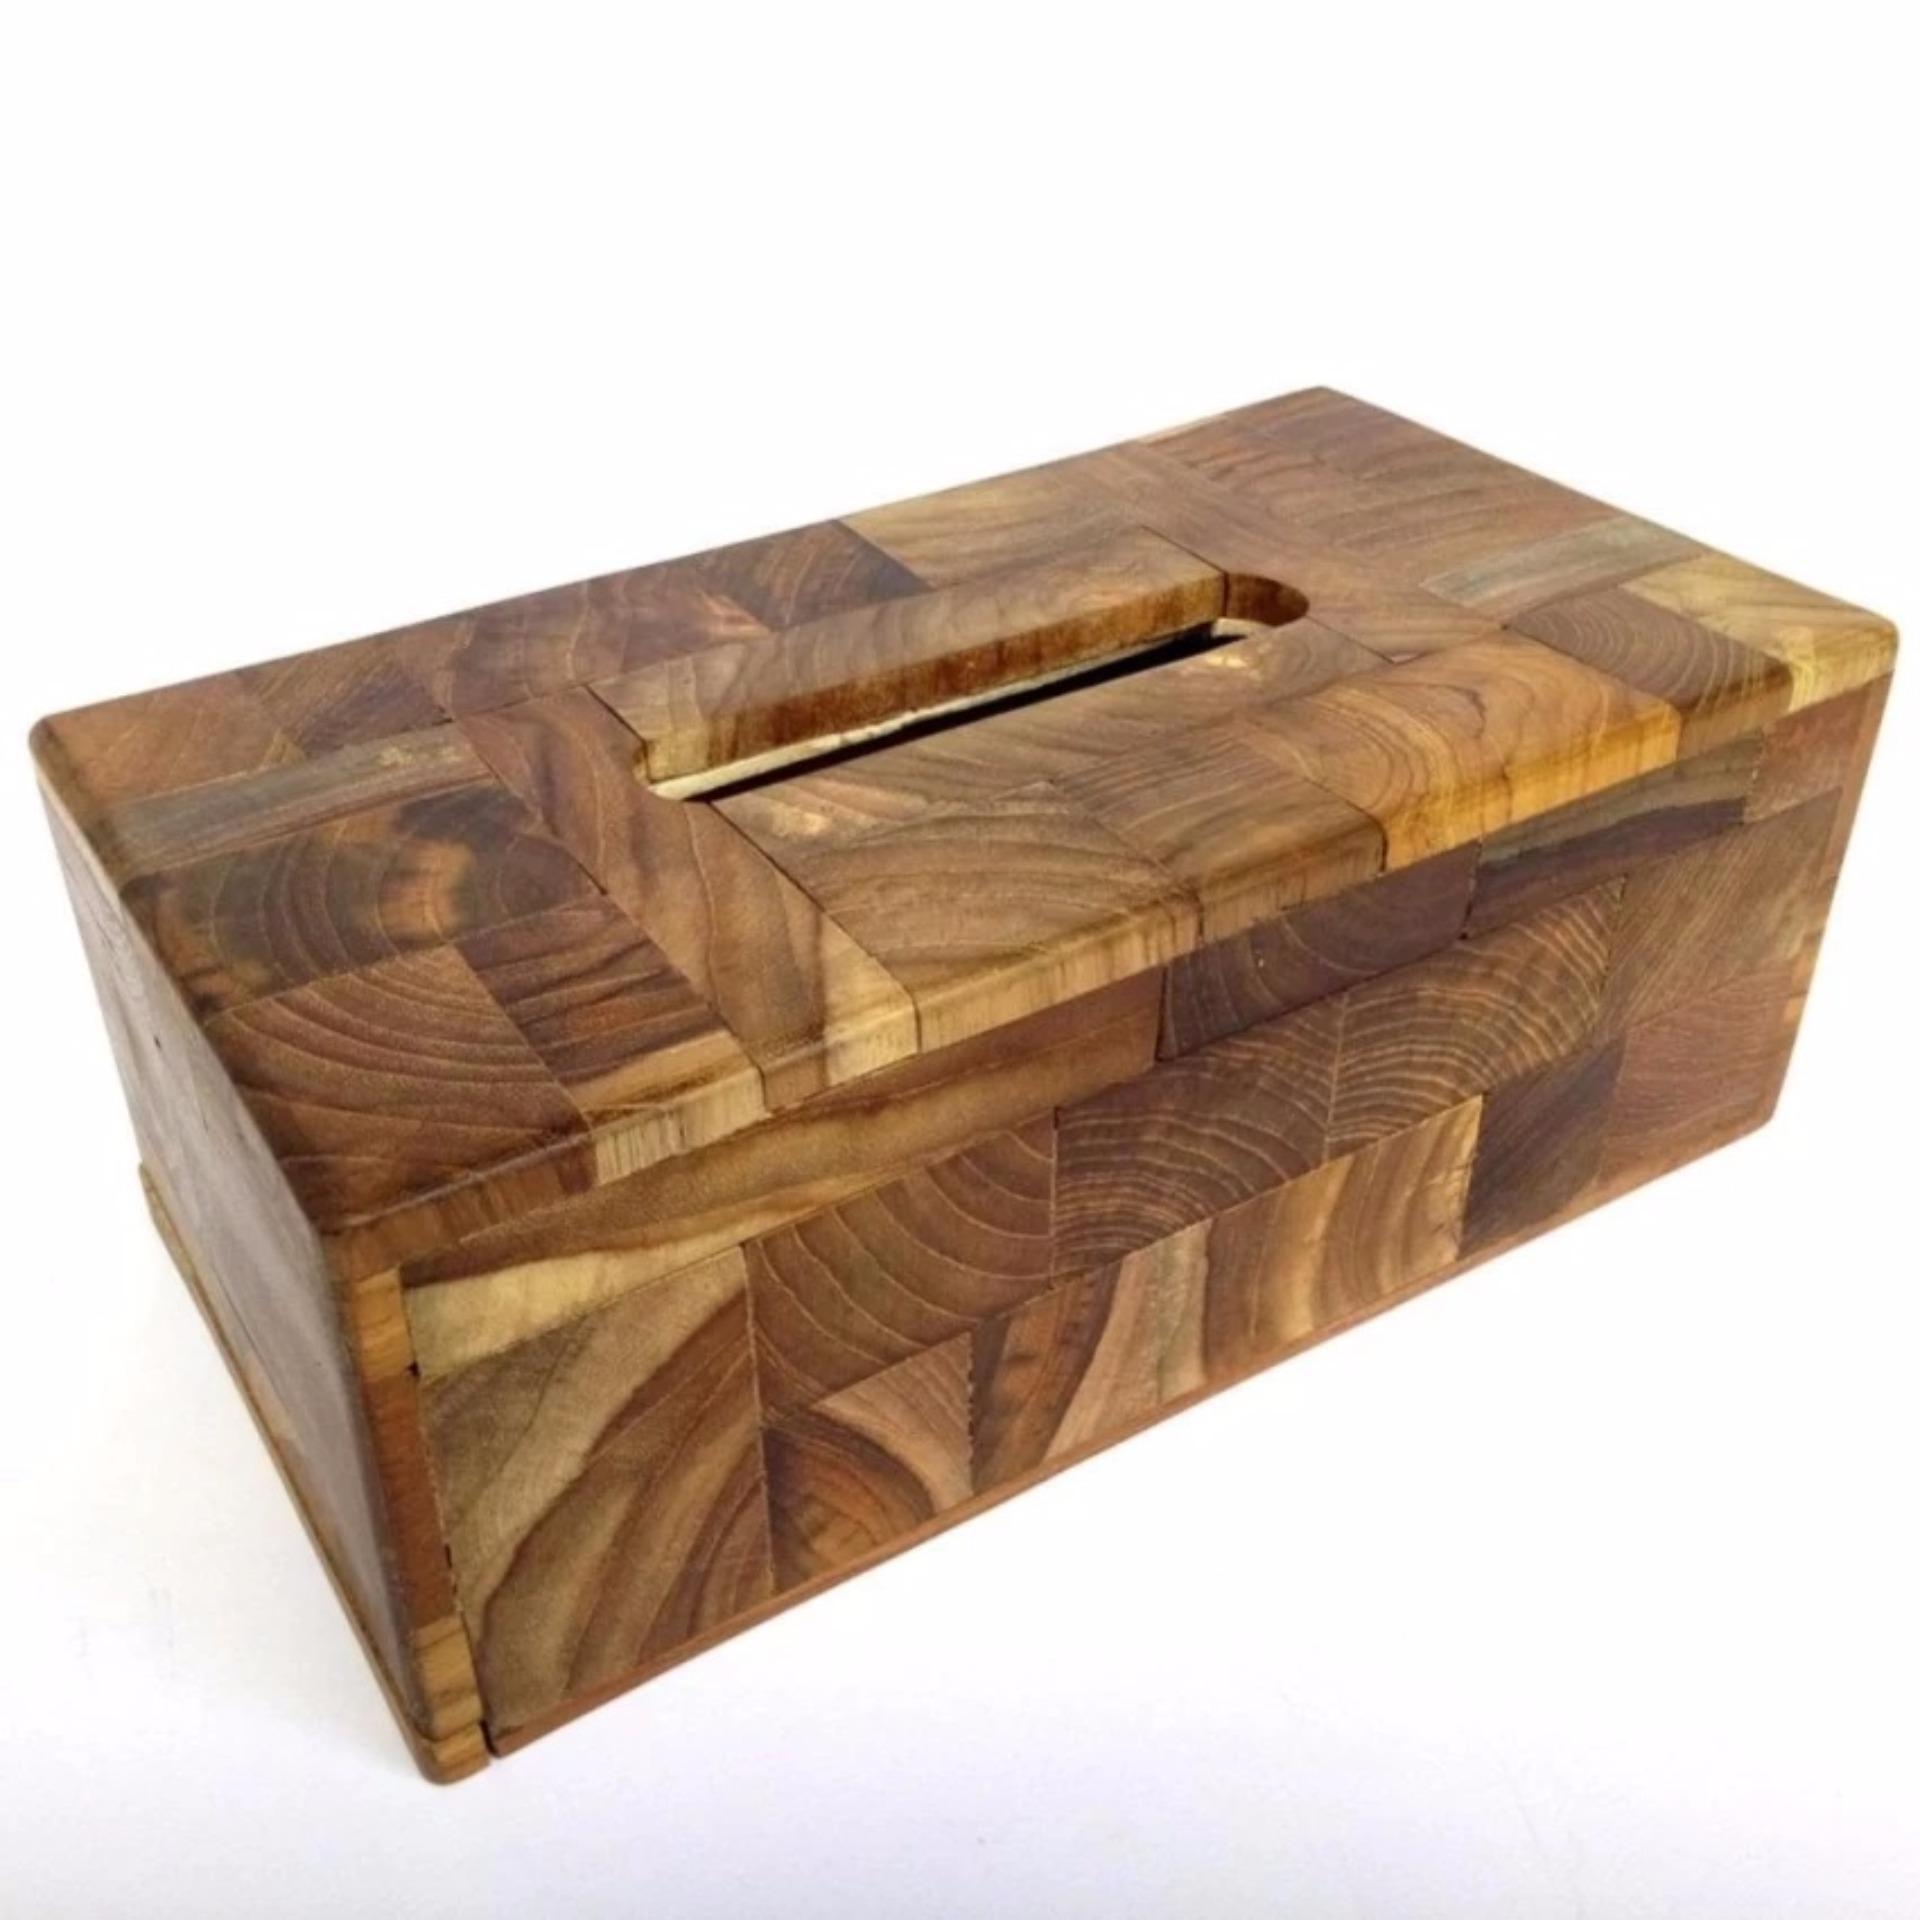 Kotak Tisu Kayu Jati / Tempat Tissue Kayu Jati Susun